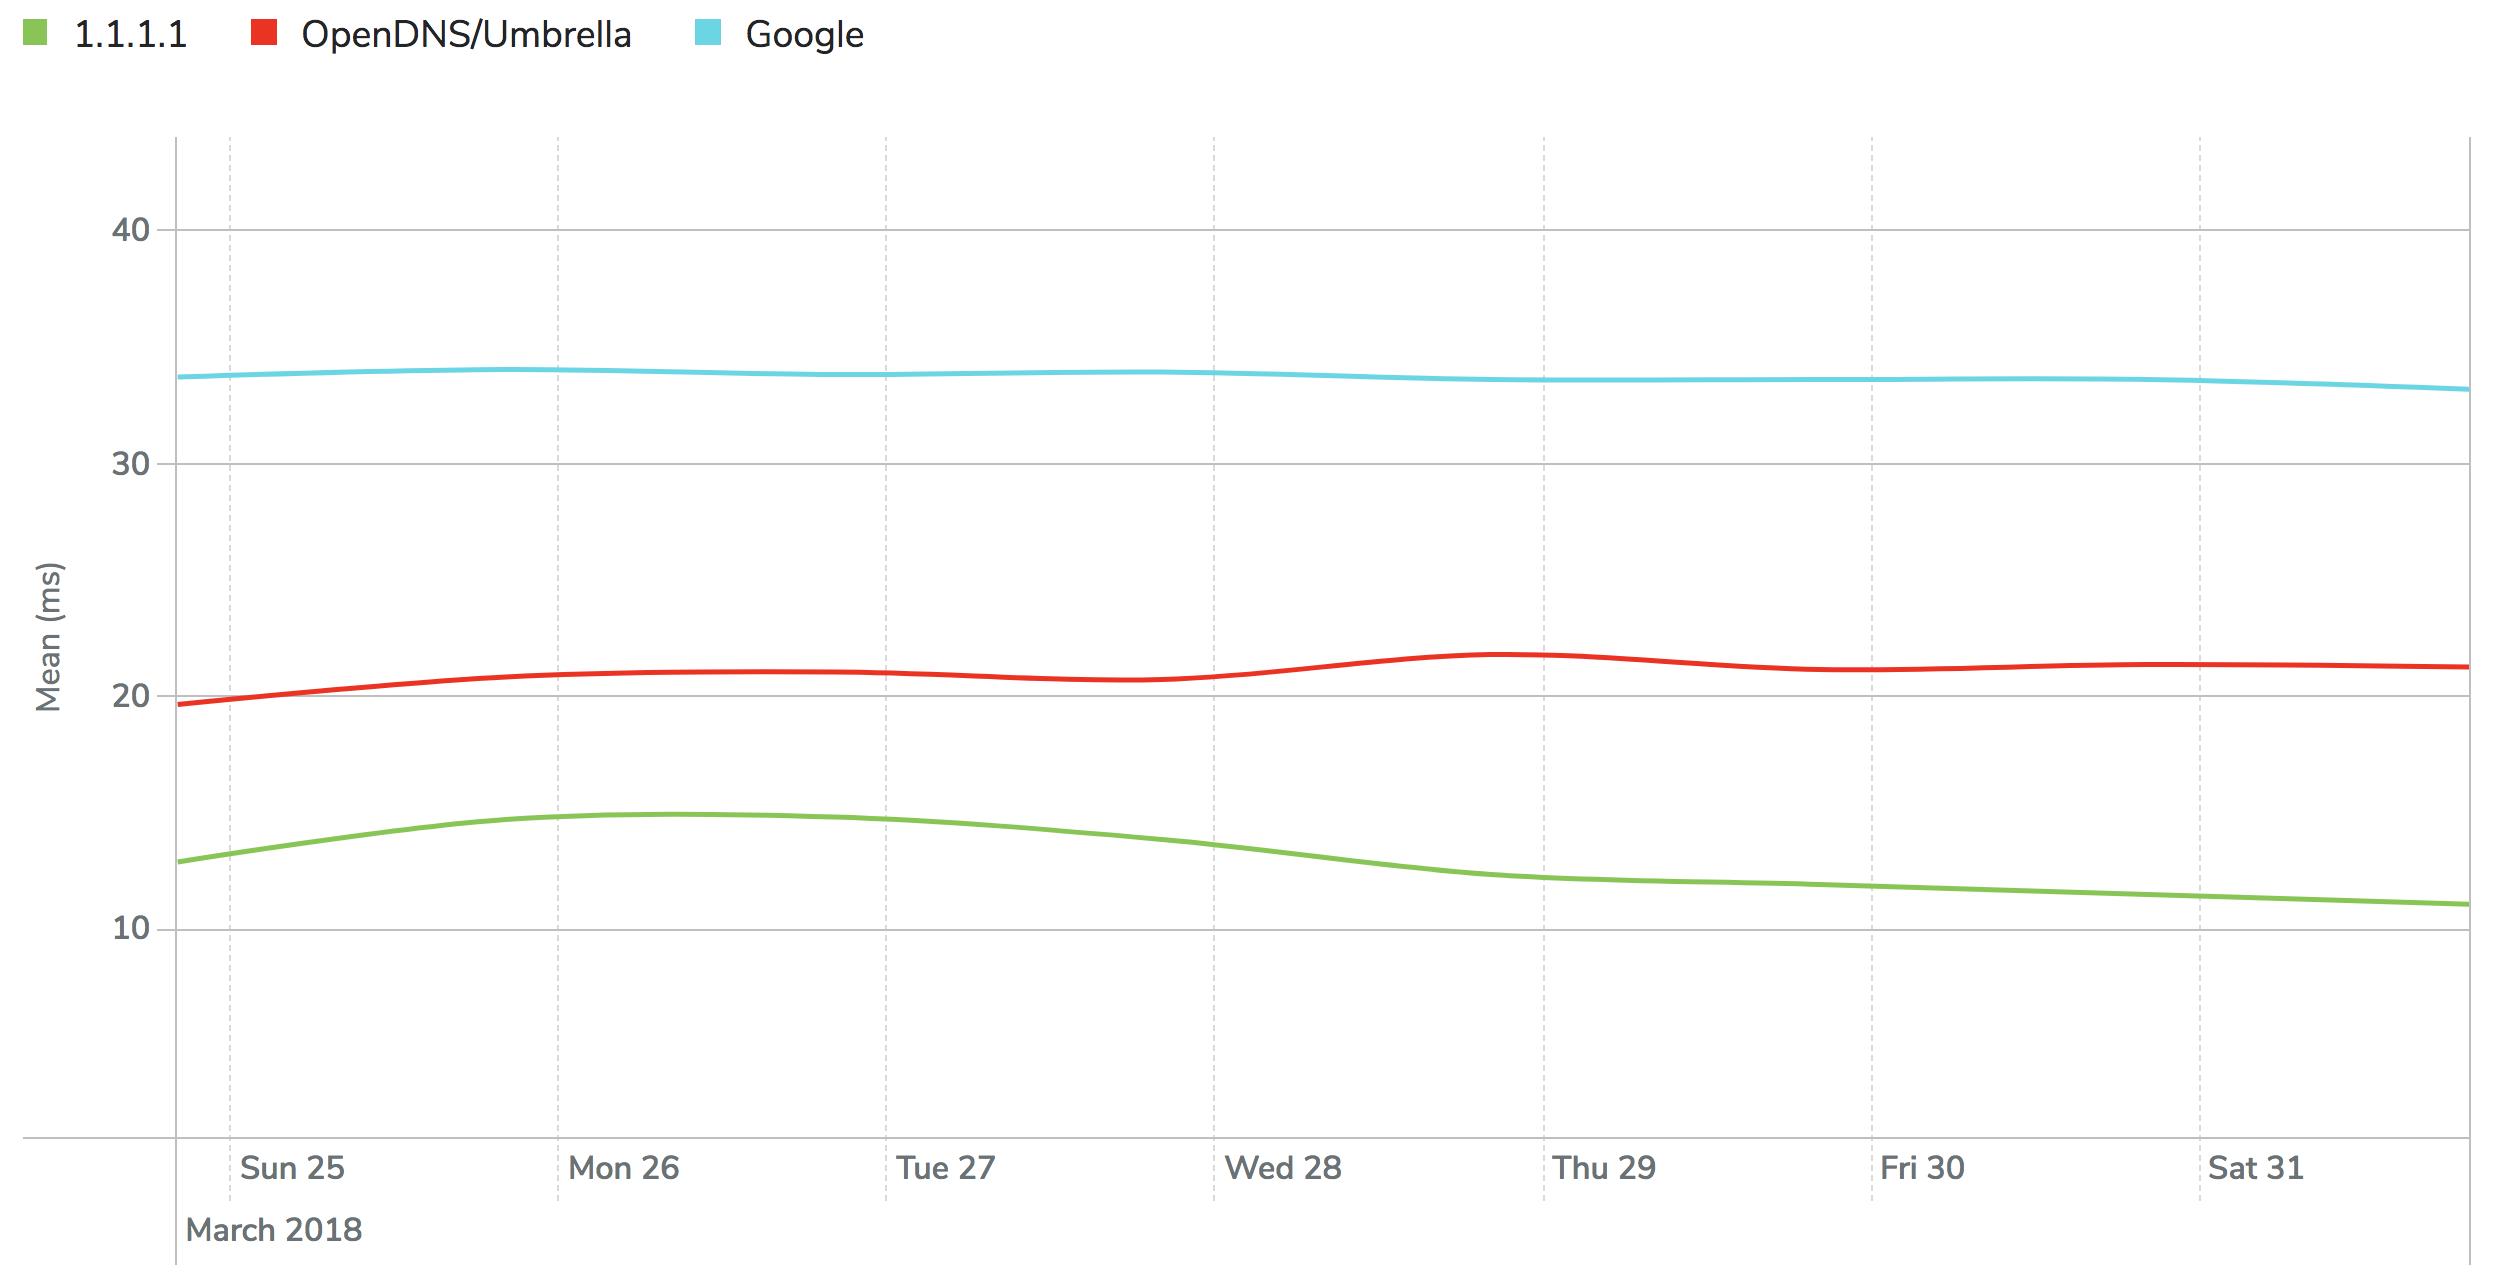 popular DNS resolvers' performance